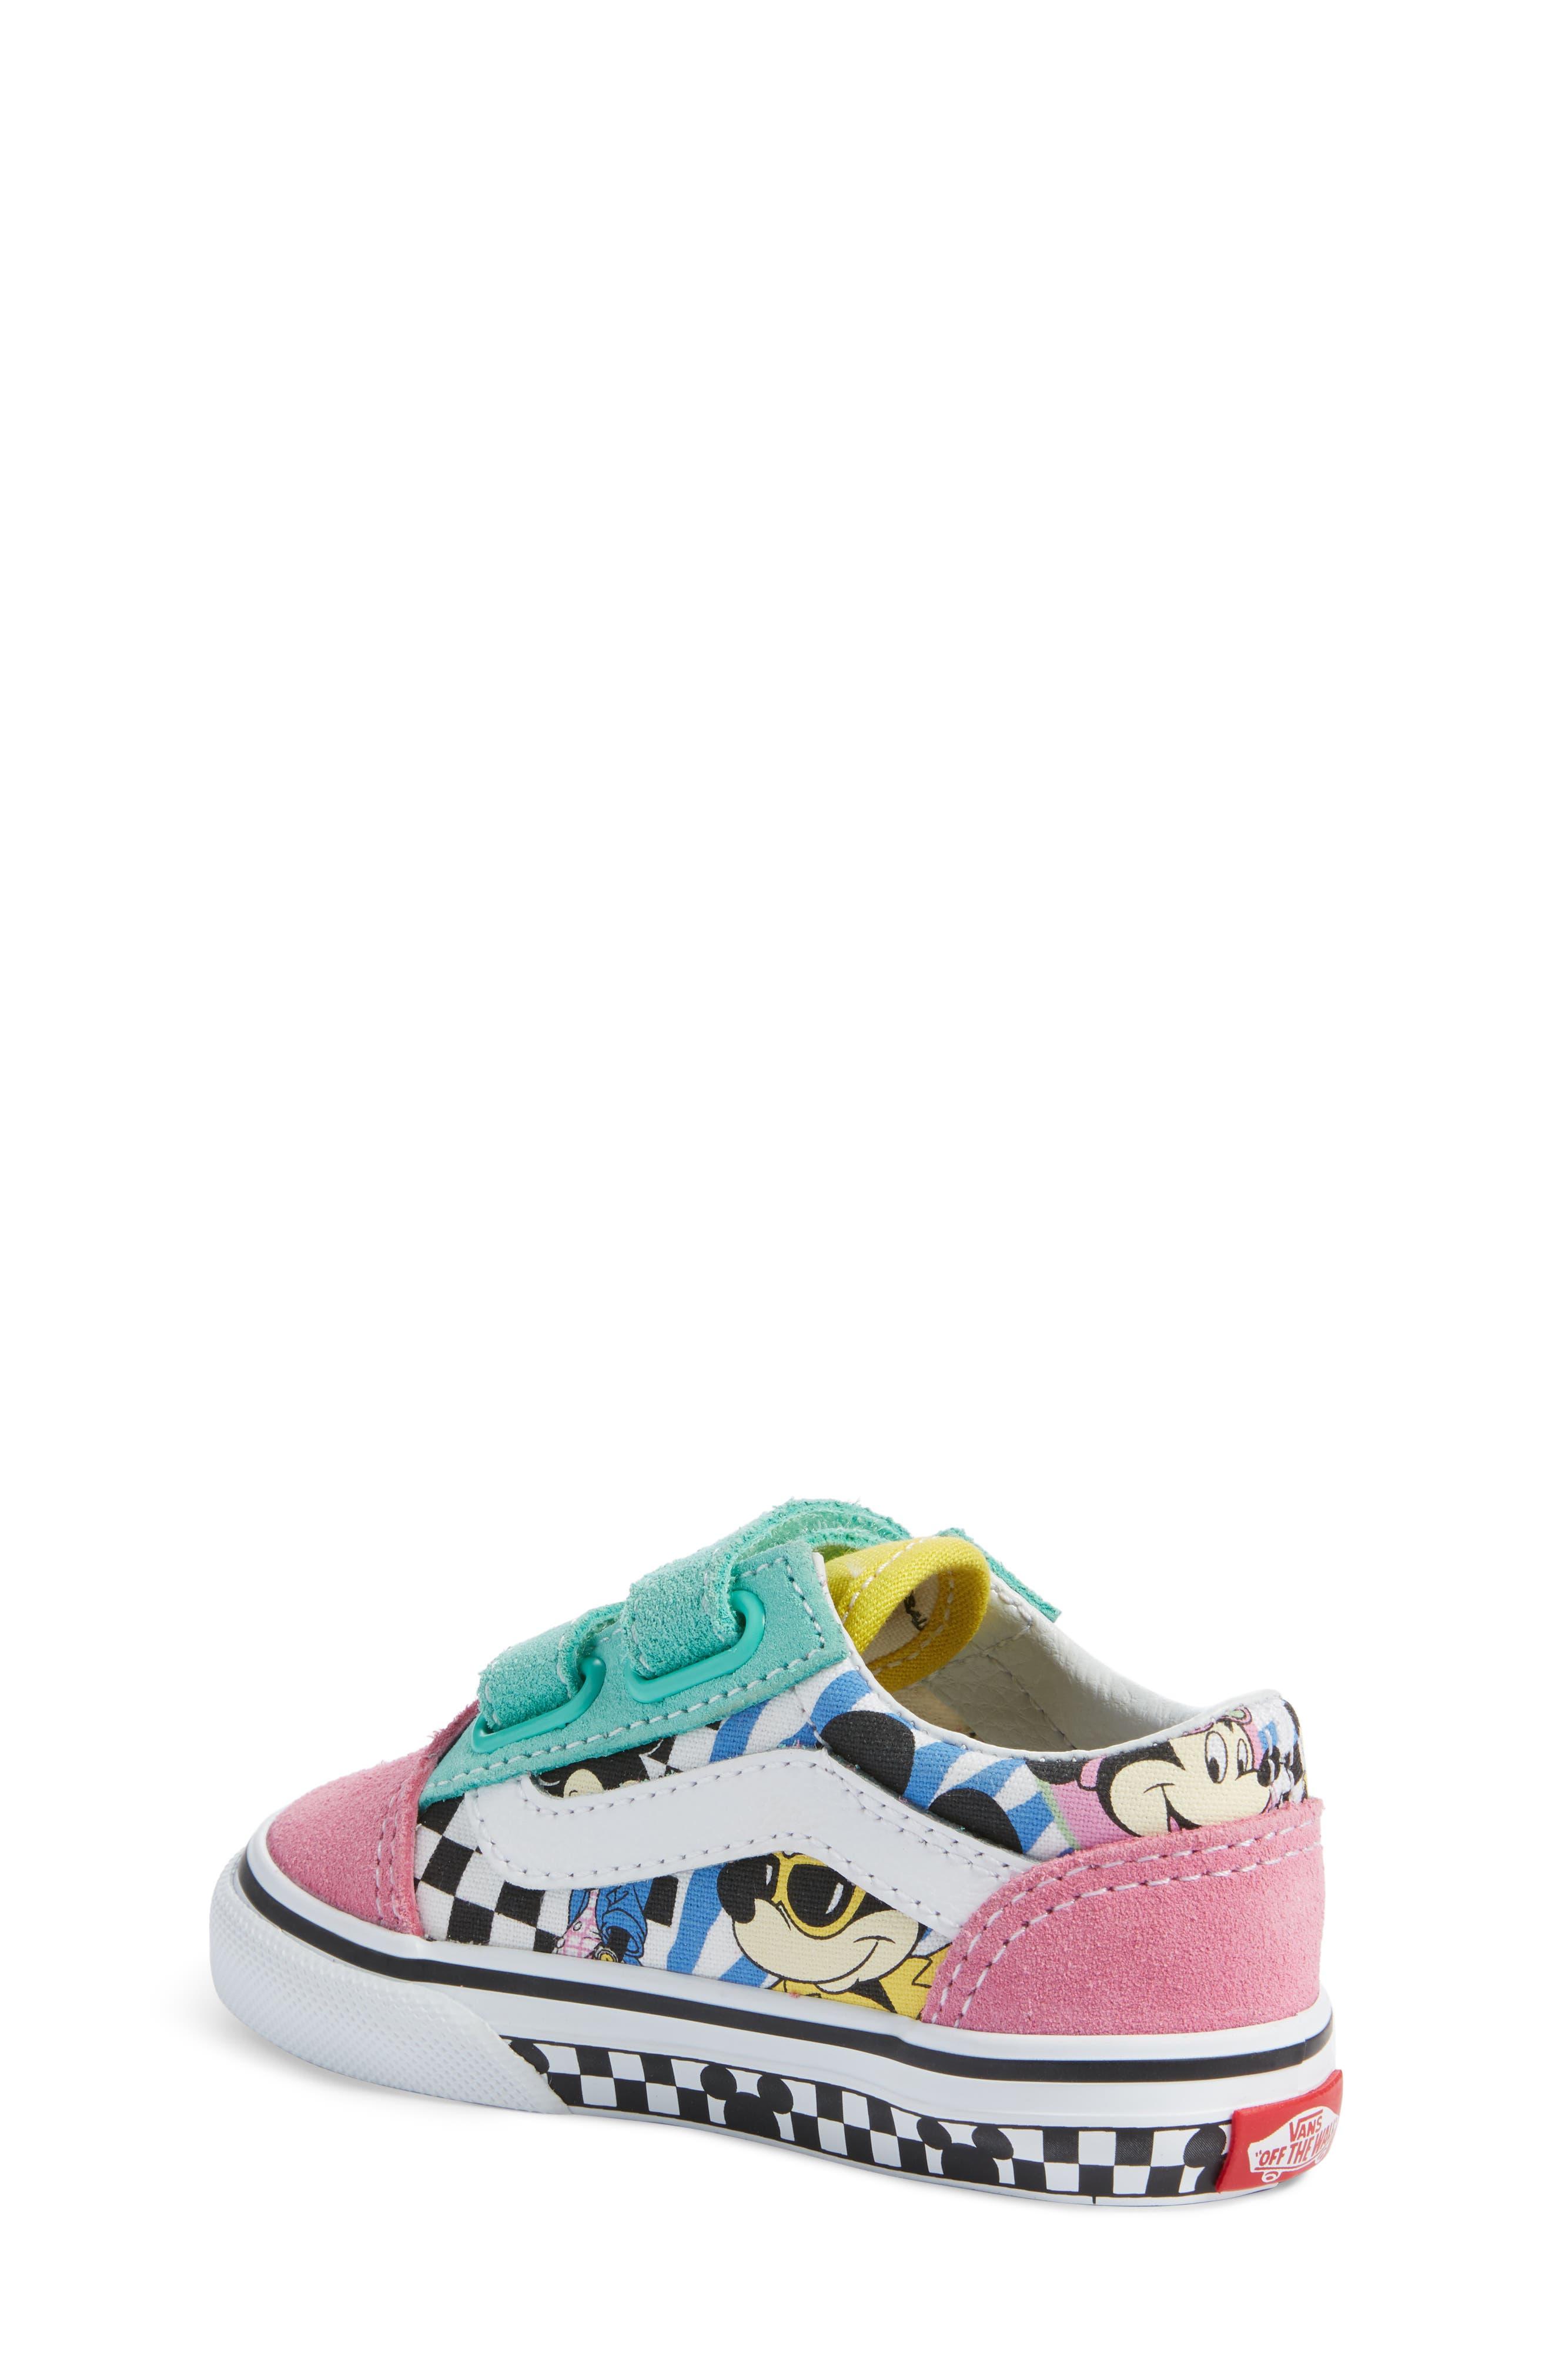 x Disney Old Skool V Sneaker,                             Alternate thumbnail 2, color,                             650